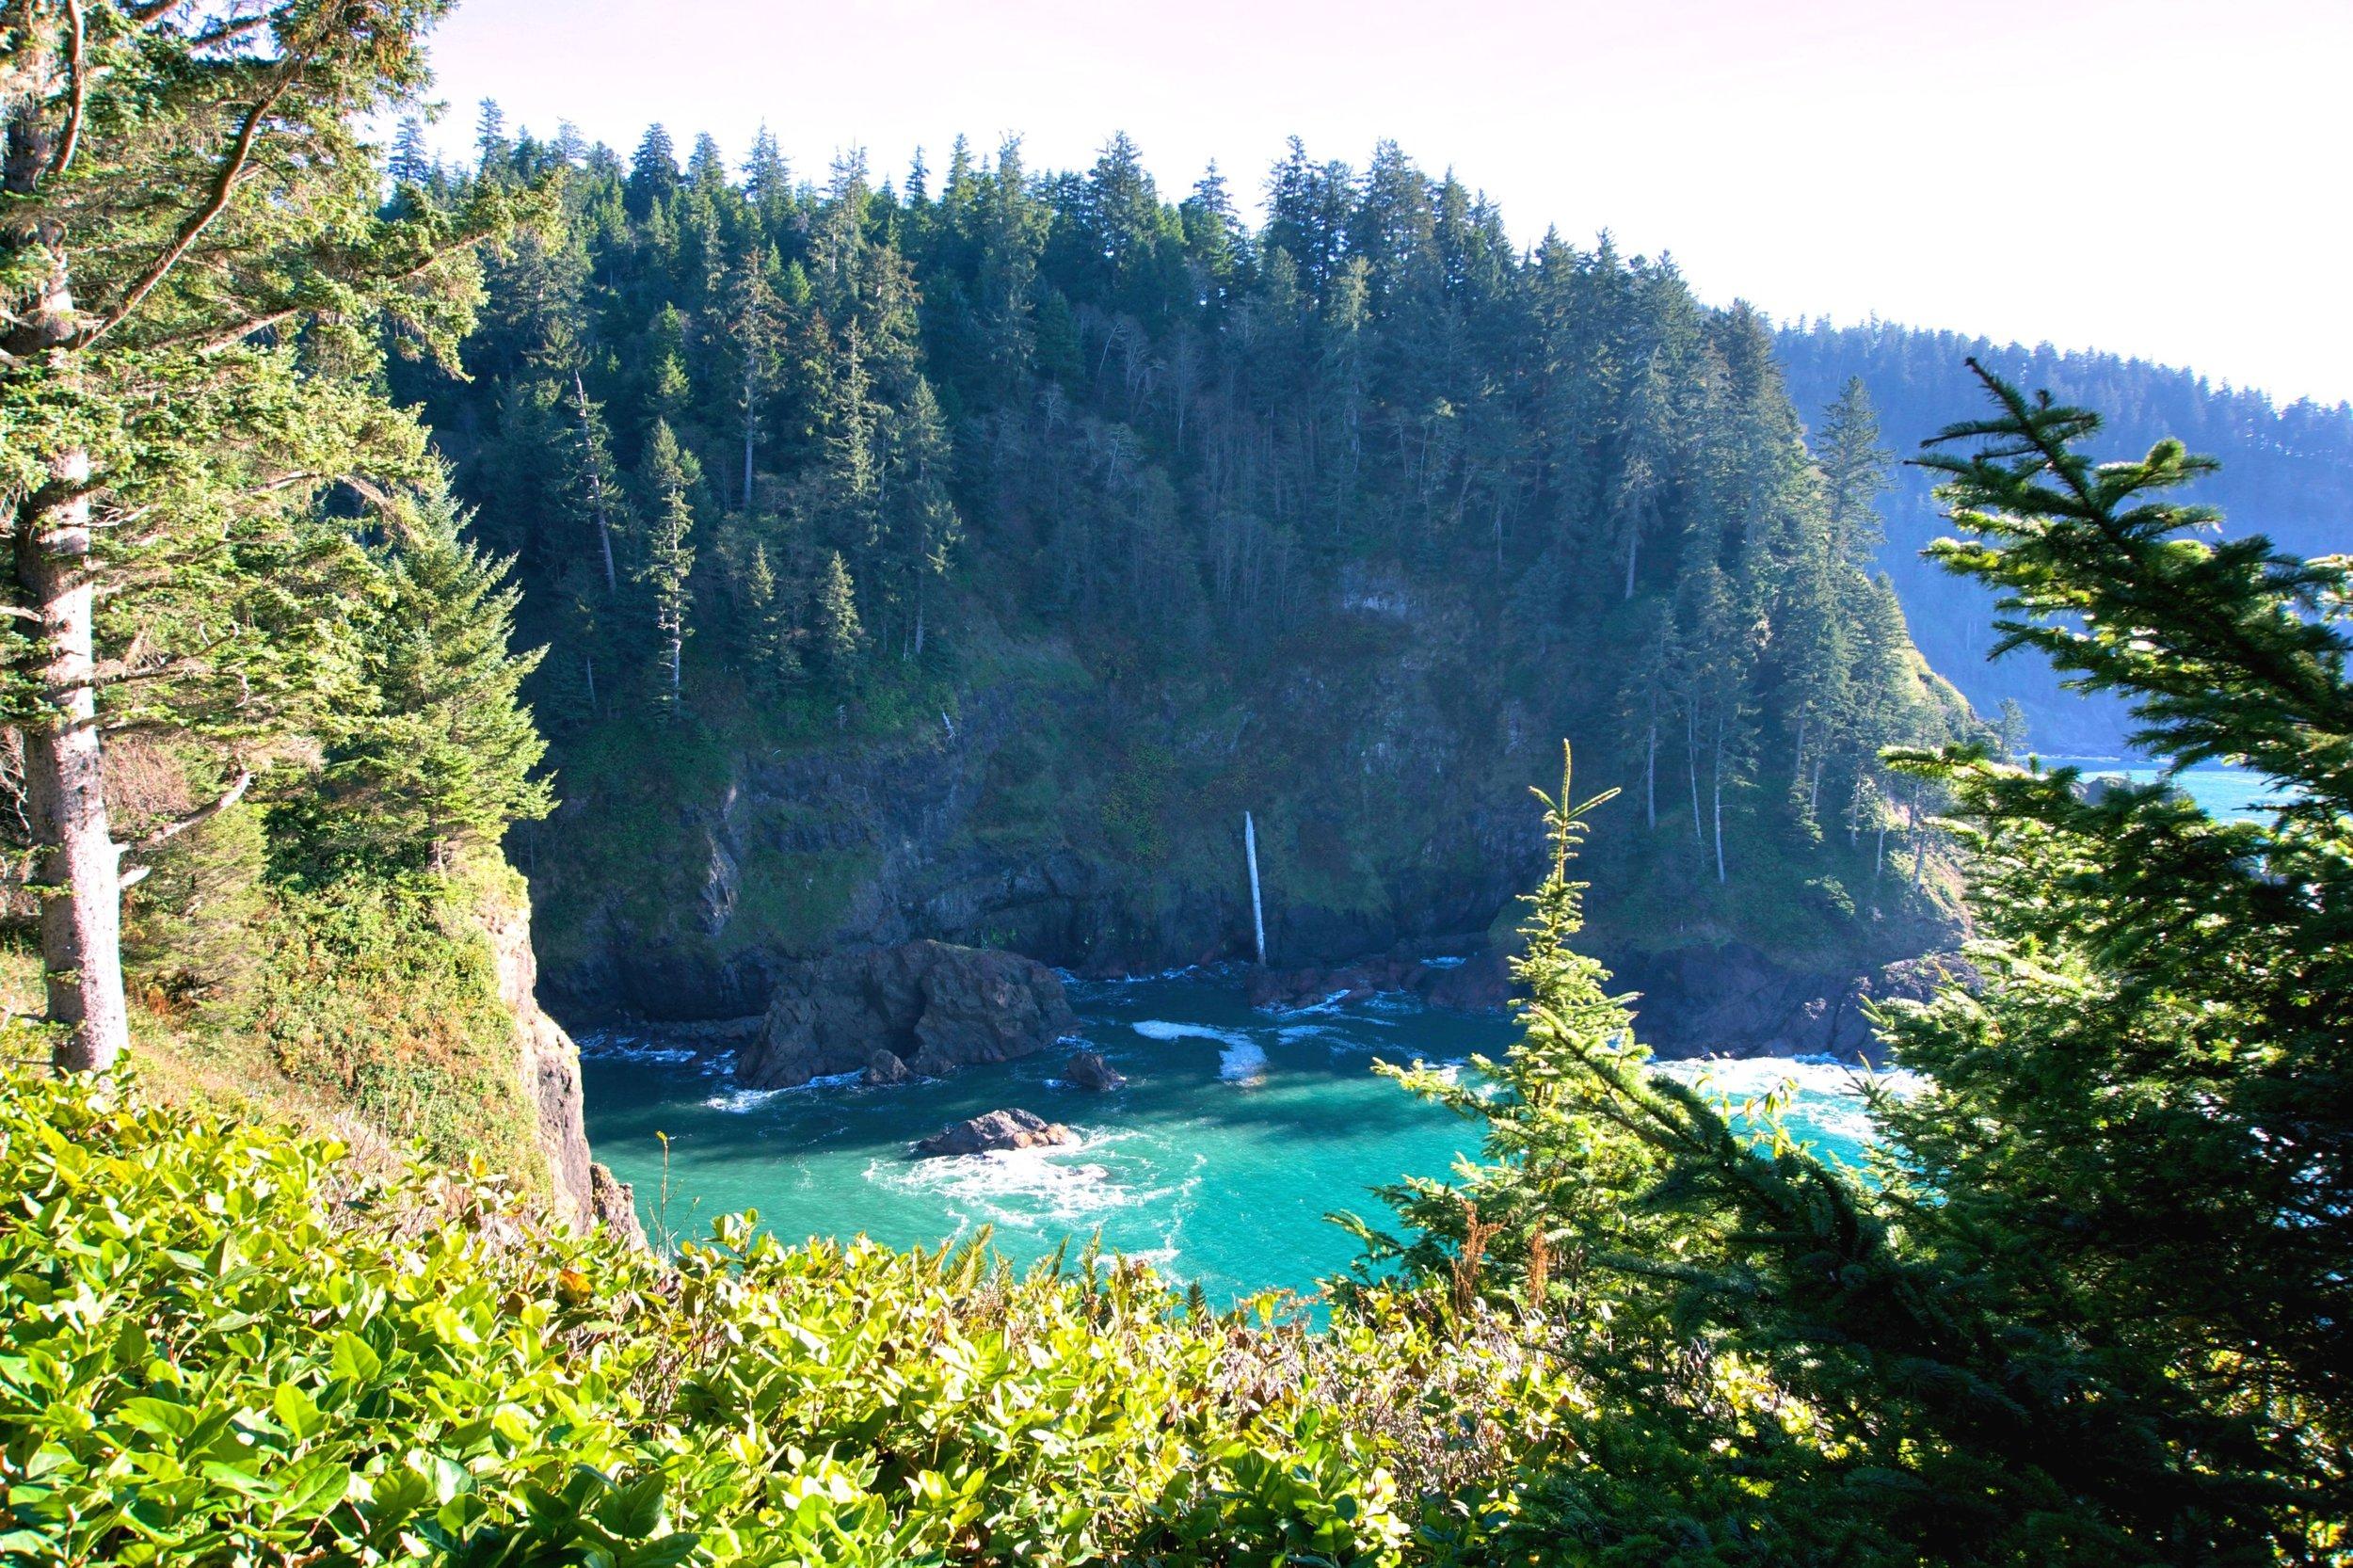 Hart's Cove, Oregon